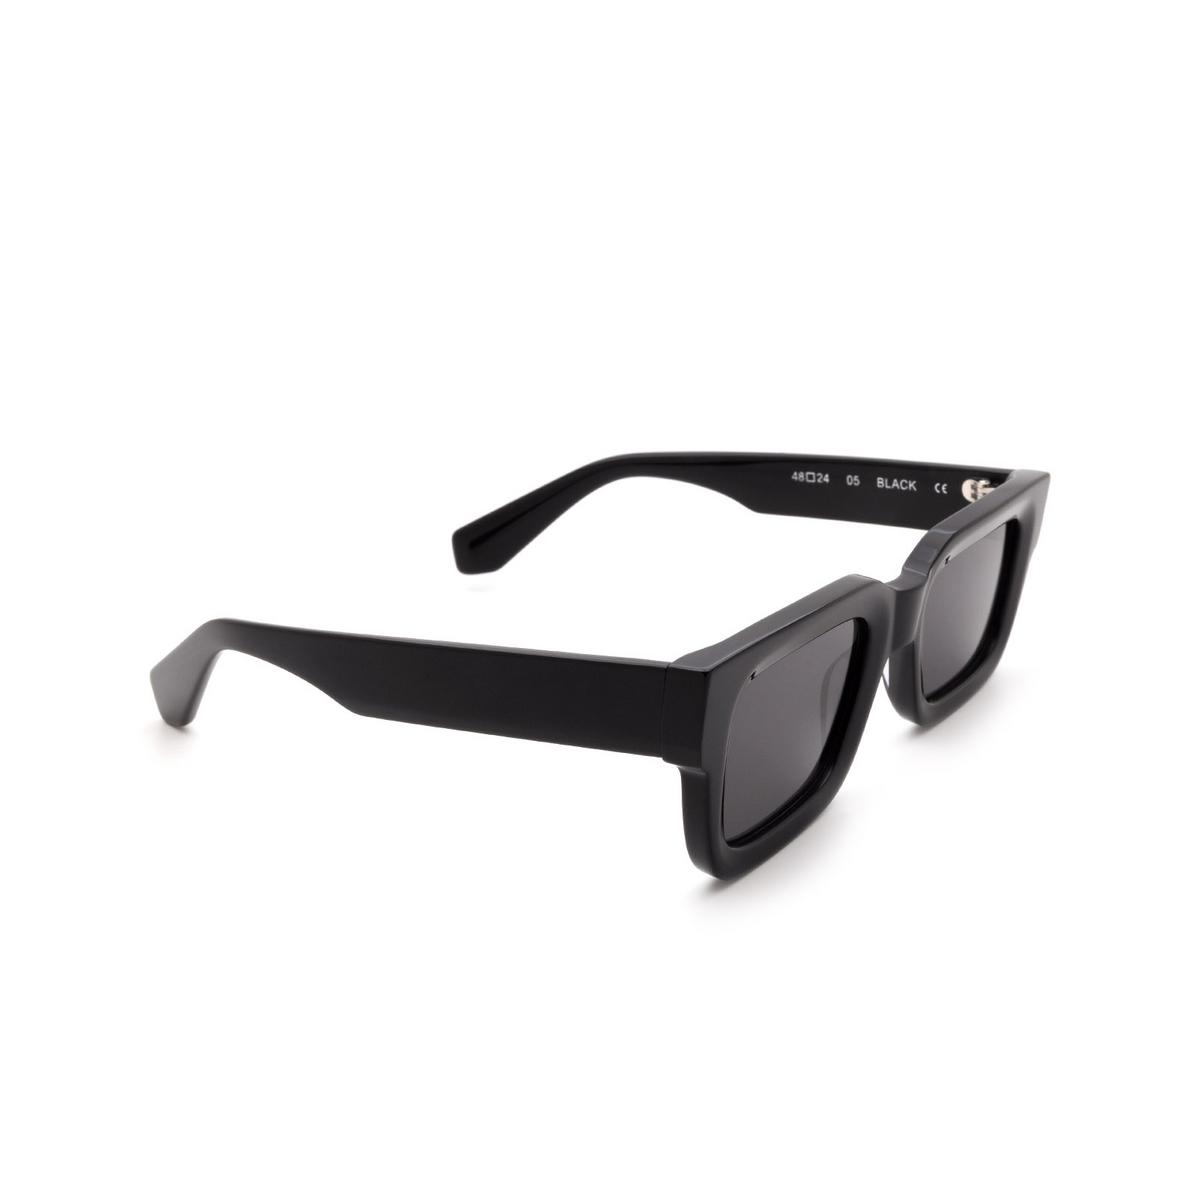 Chimi® Rectangle Sunglasses: 05 color Black - three-quarters view.